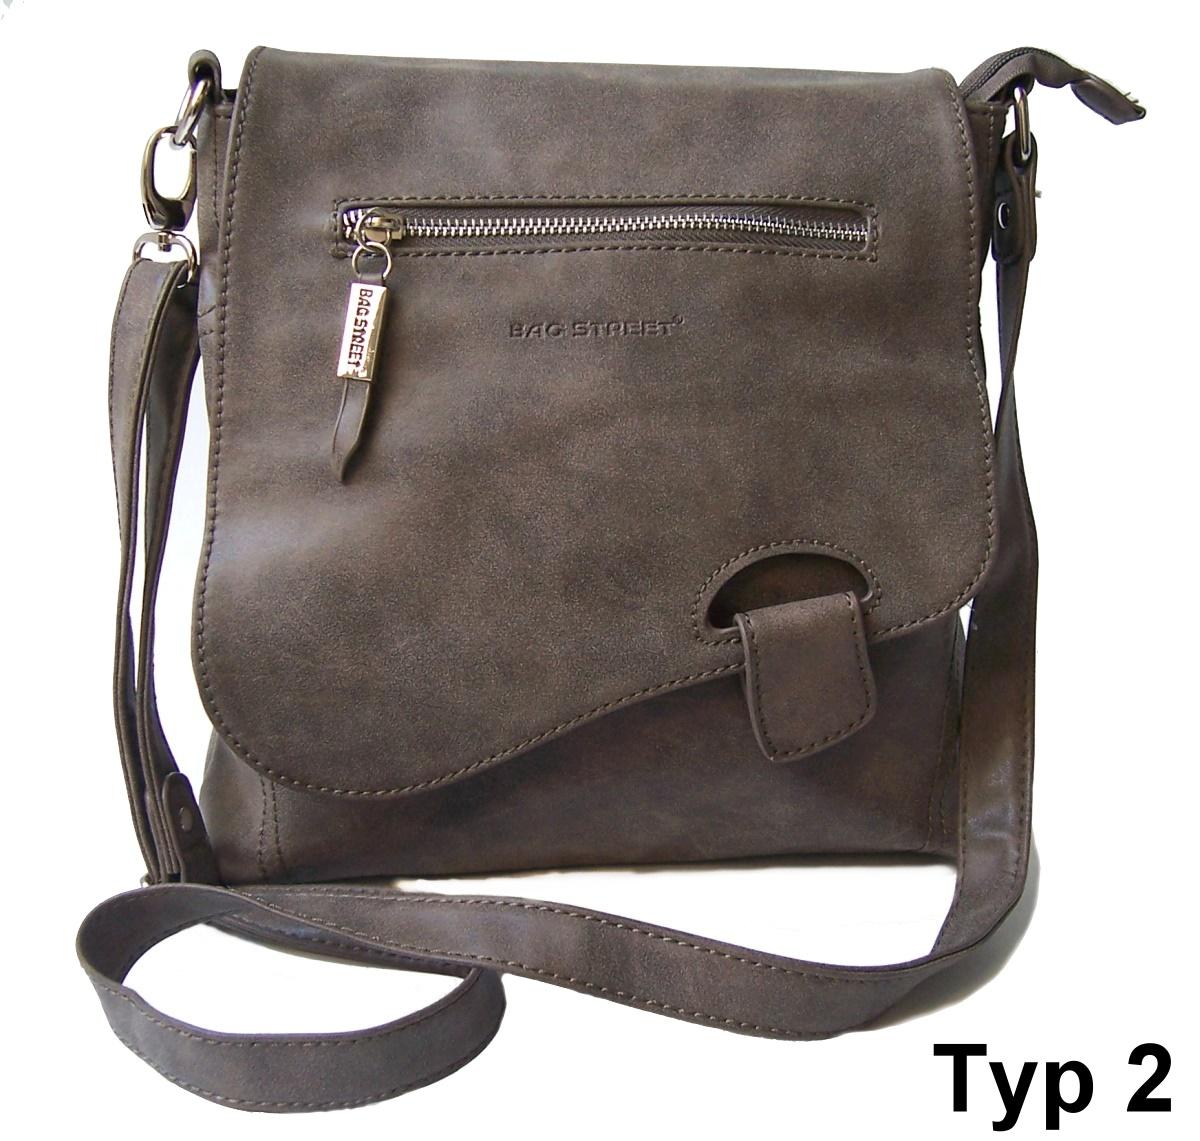 Details zu Tasche Handtasche Umhängetasche Damentasche Schultertasche Bag Street Damen VTa1